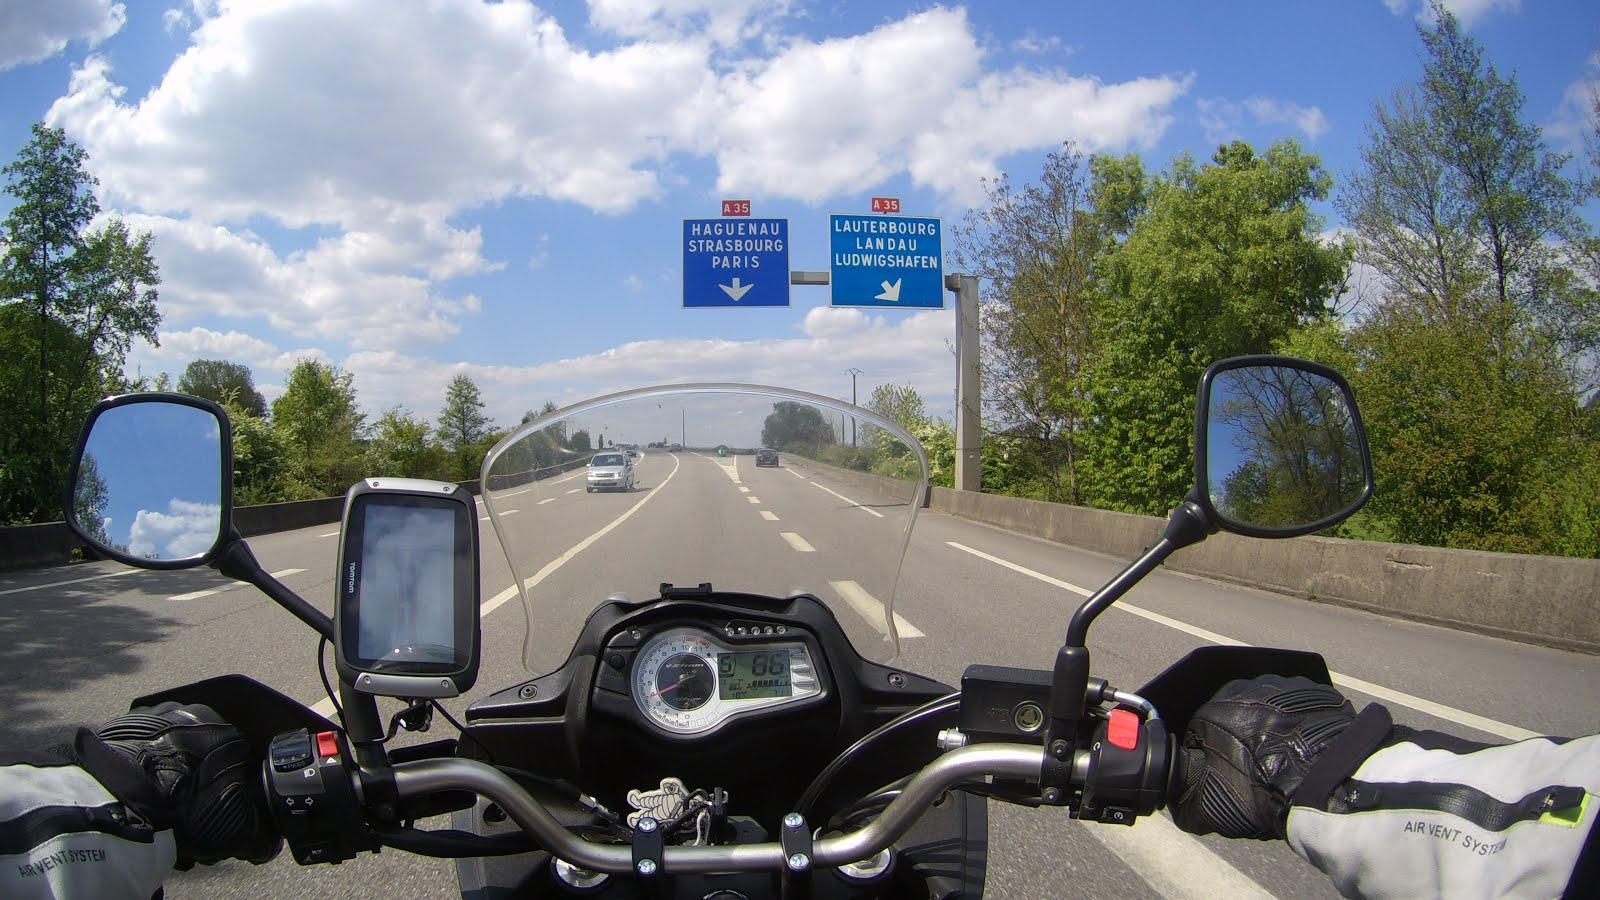 motorrad tourenfahrer blog motorradfahren in frankreich. Black Bedroom Furniture Sets. Home Design Ideas